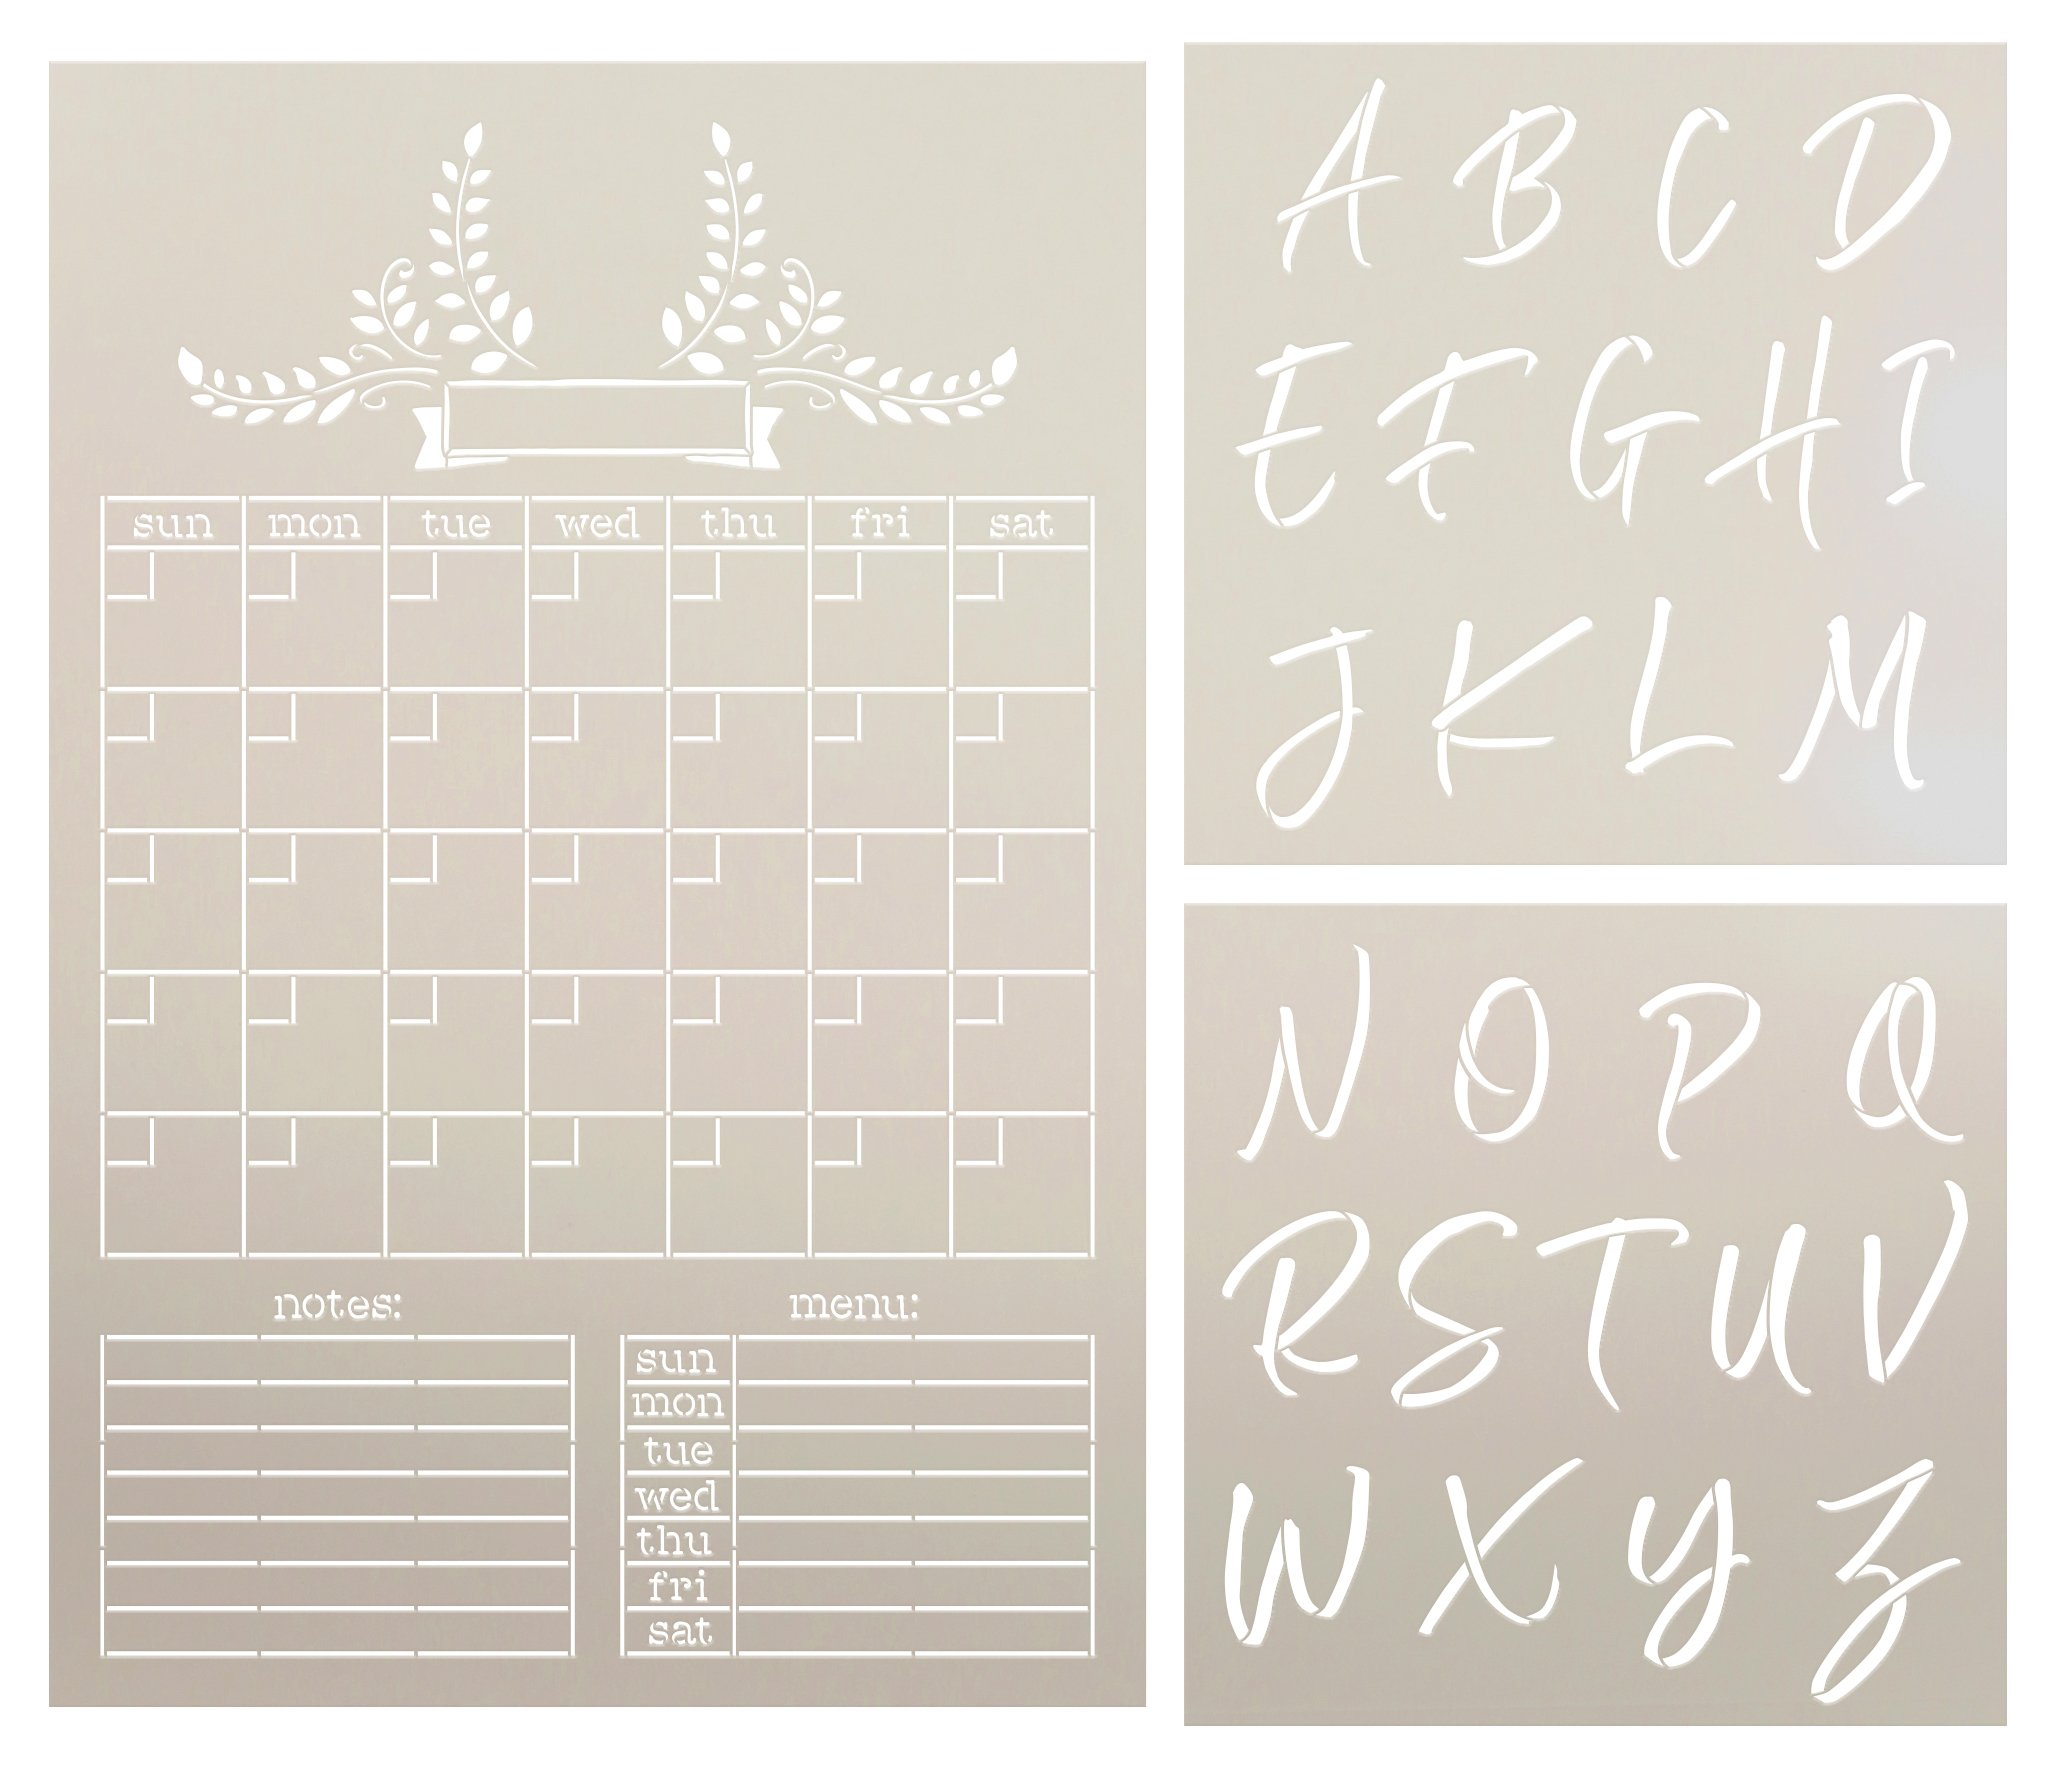 Farmhouse Chalkboard Calendar & Monogram 3-Part Stencil Set by StudioR12 | DIY Home & Kitchen Decor | Craft & Paint Wood Signs | Size